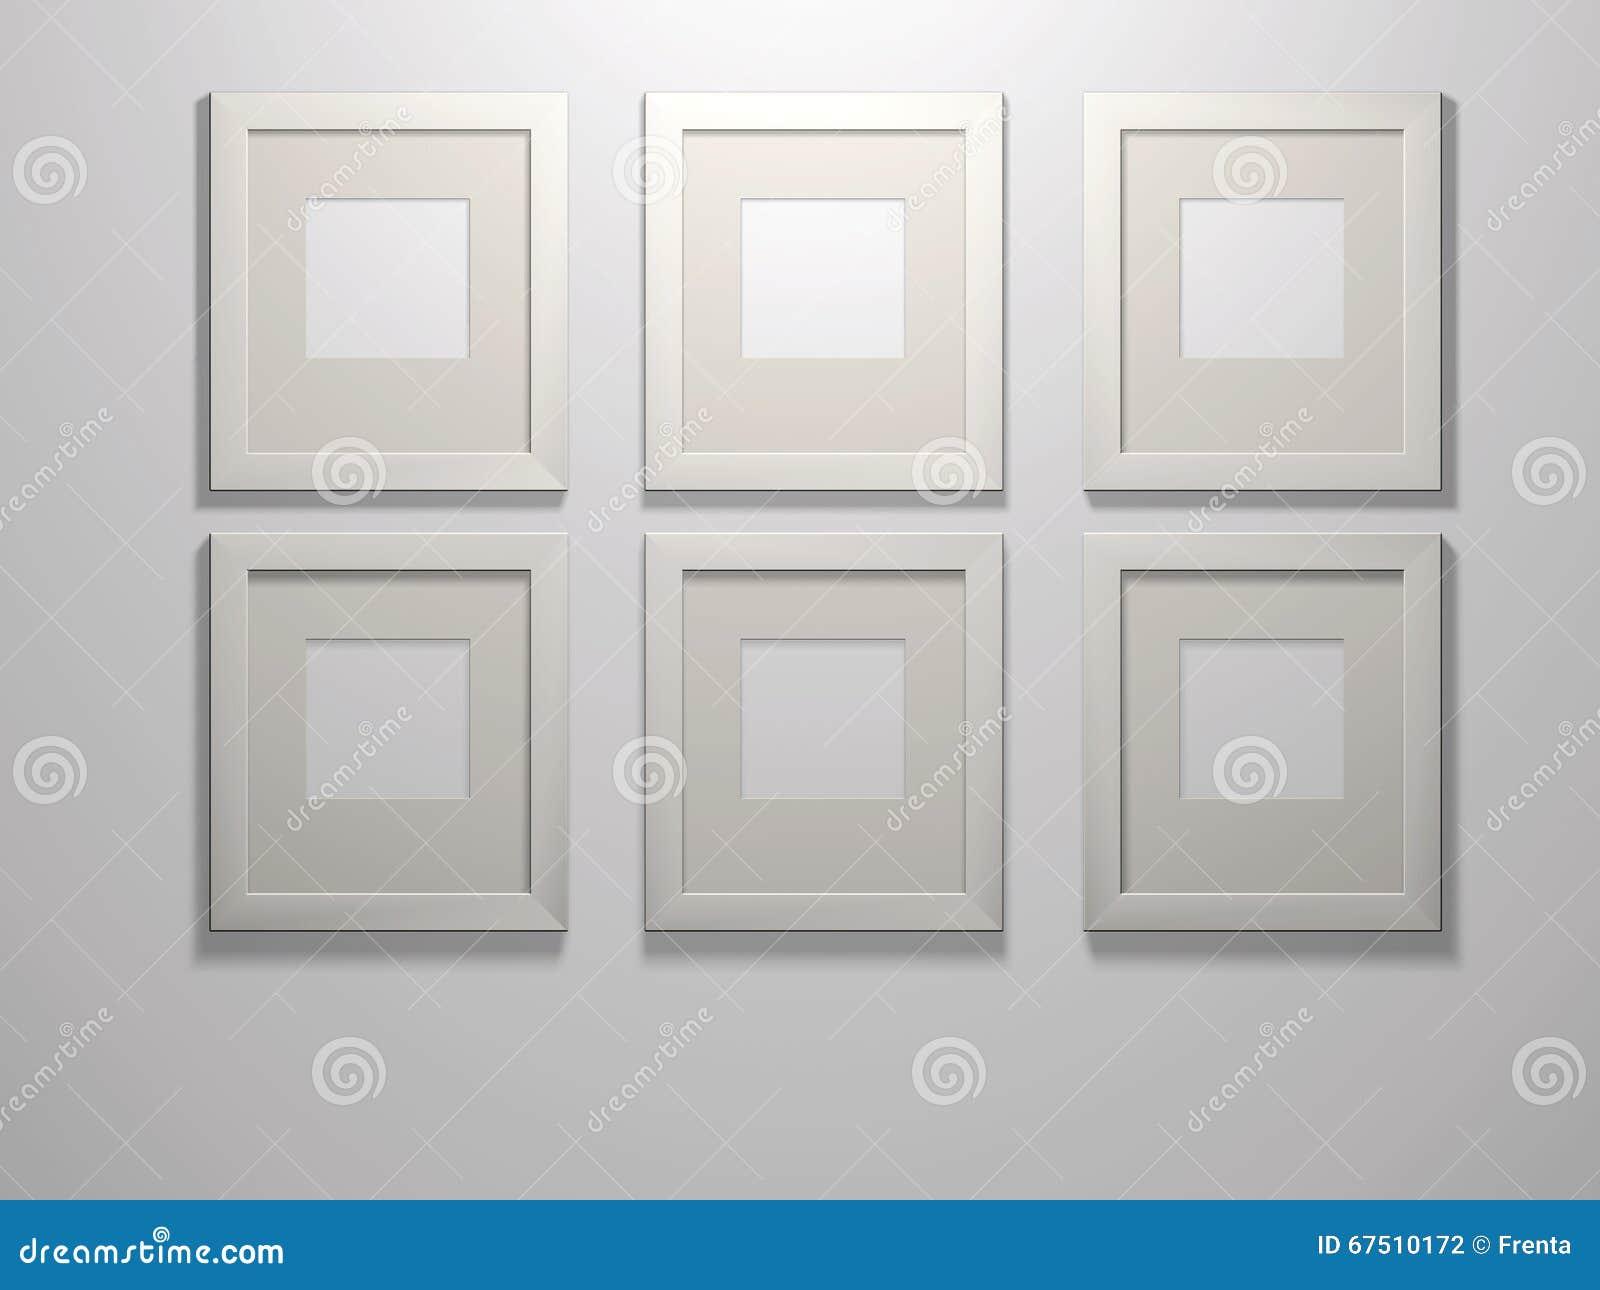 Sechs Bilderrahmen stock abbildung. Illustration von feld - 67510172